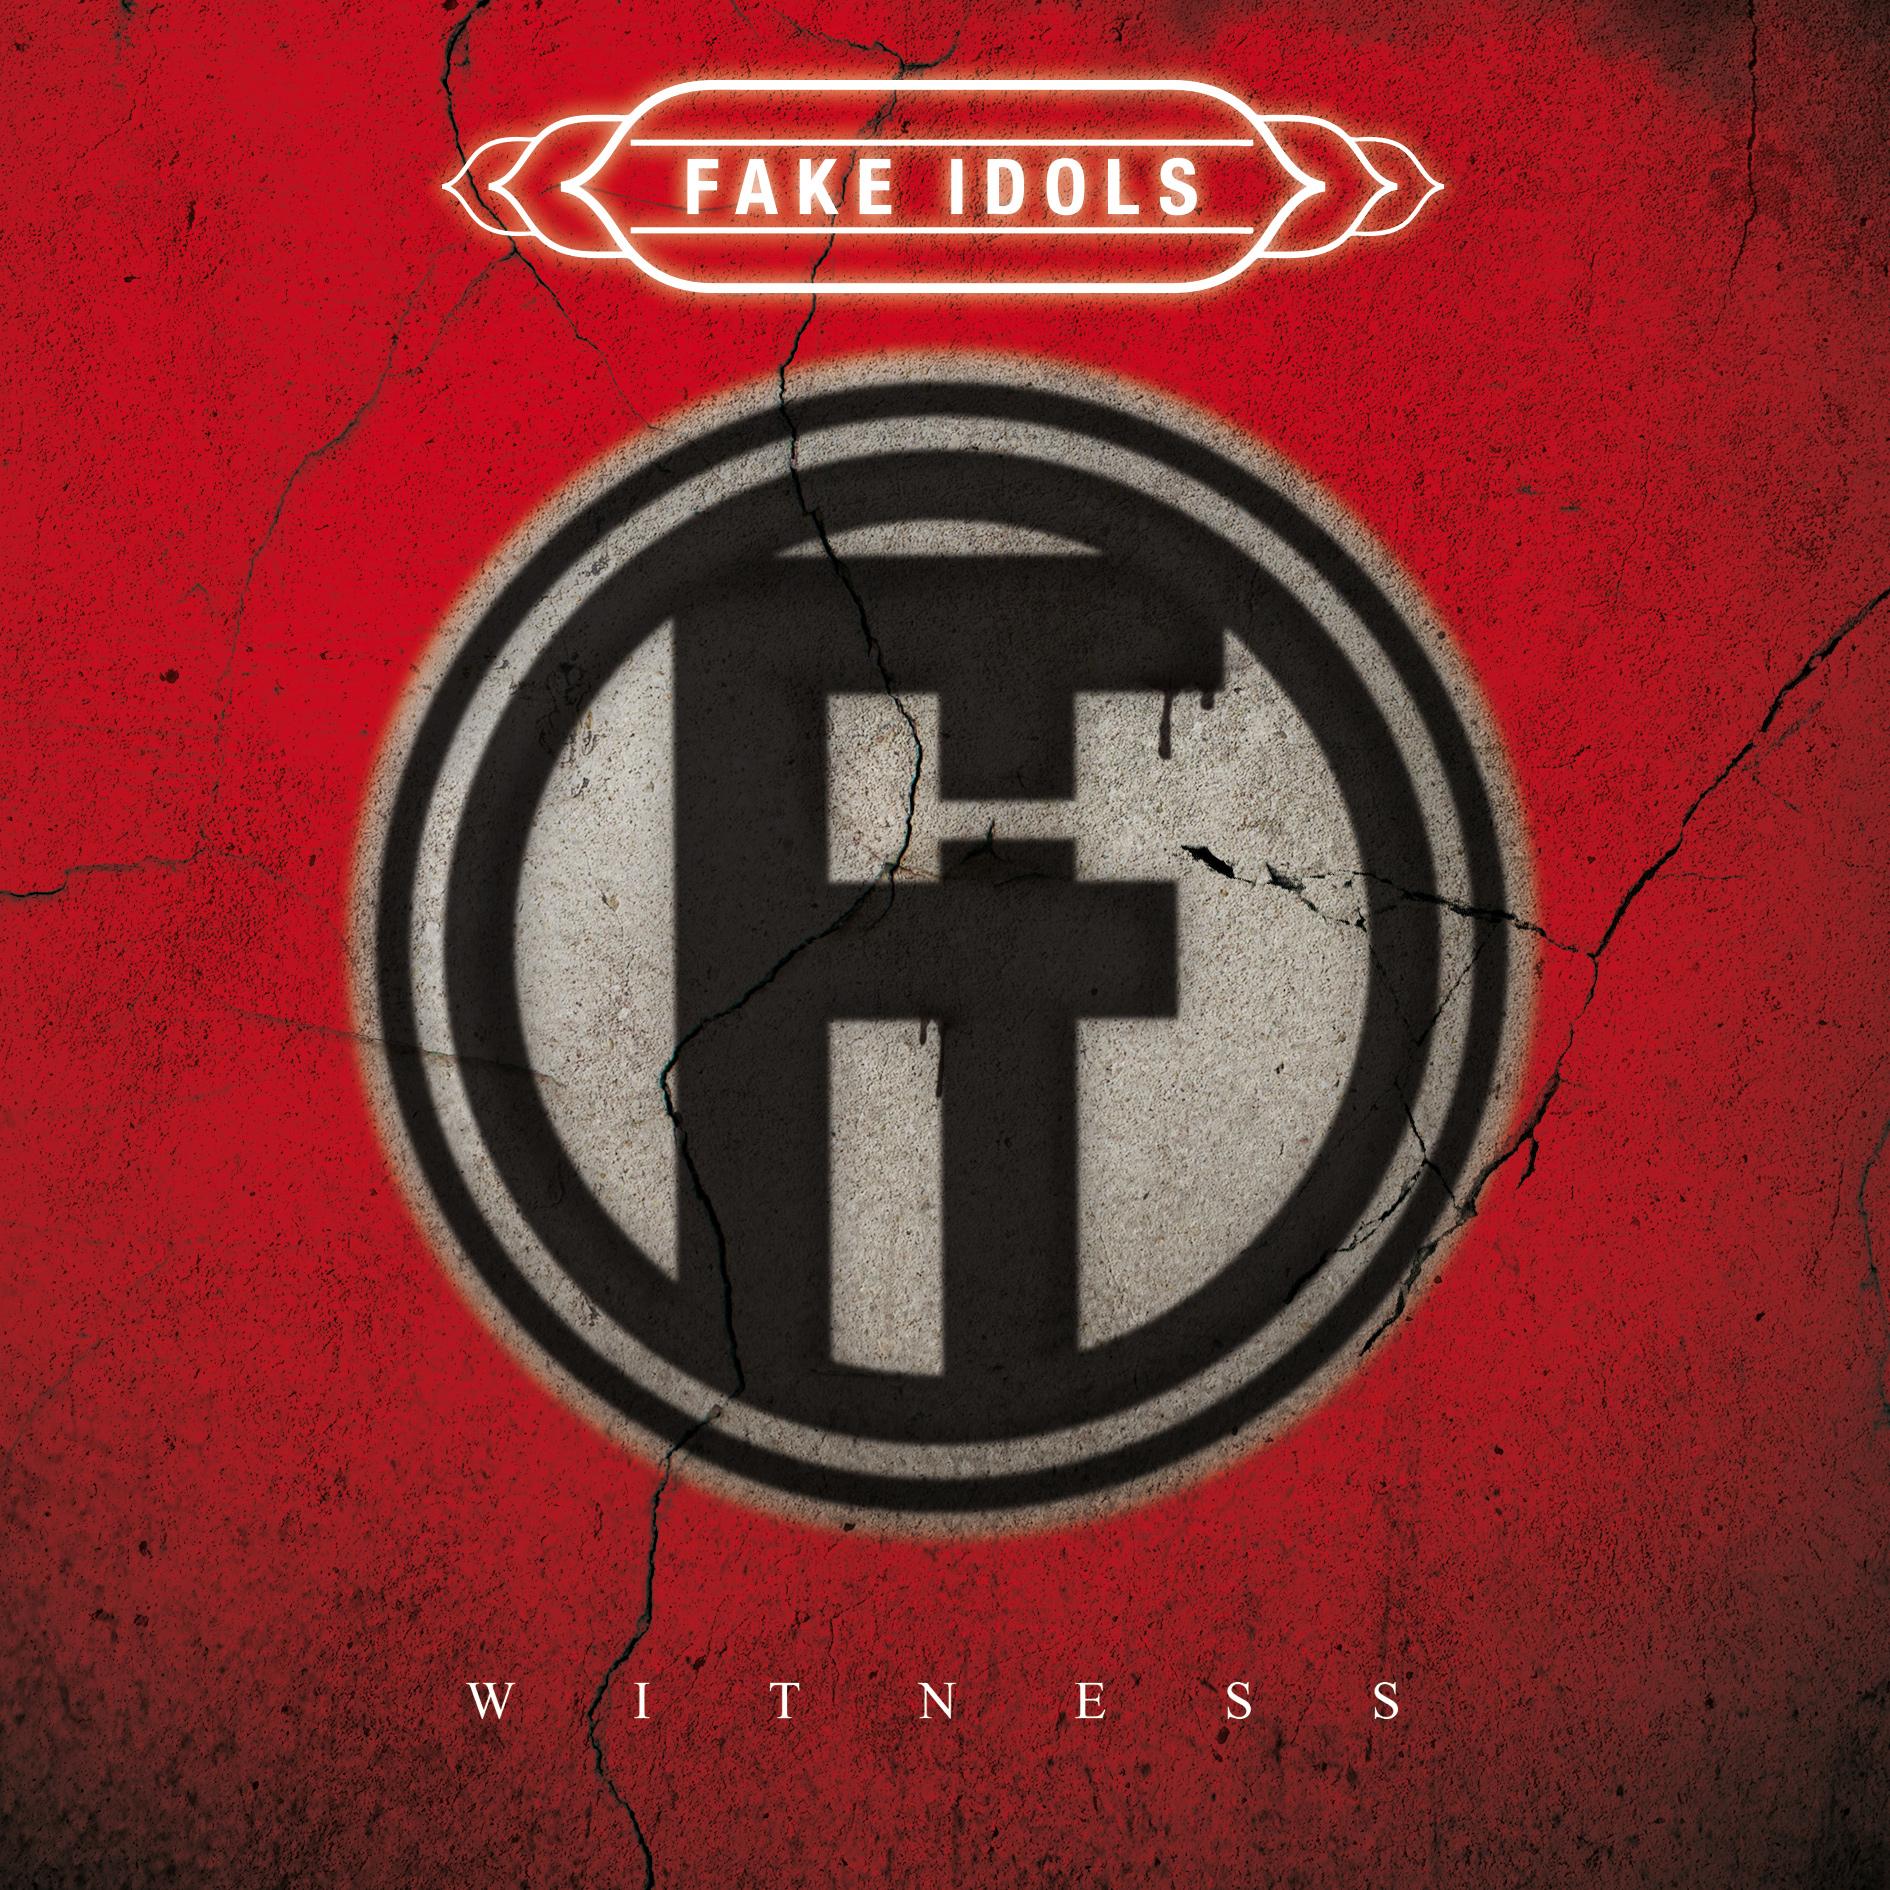 Fake Idols – Witness